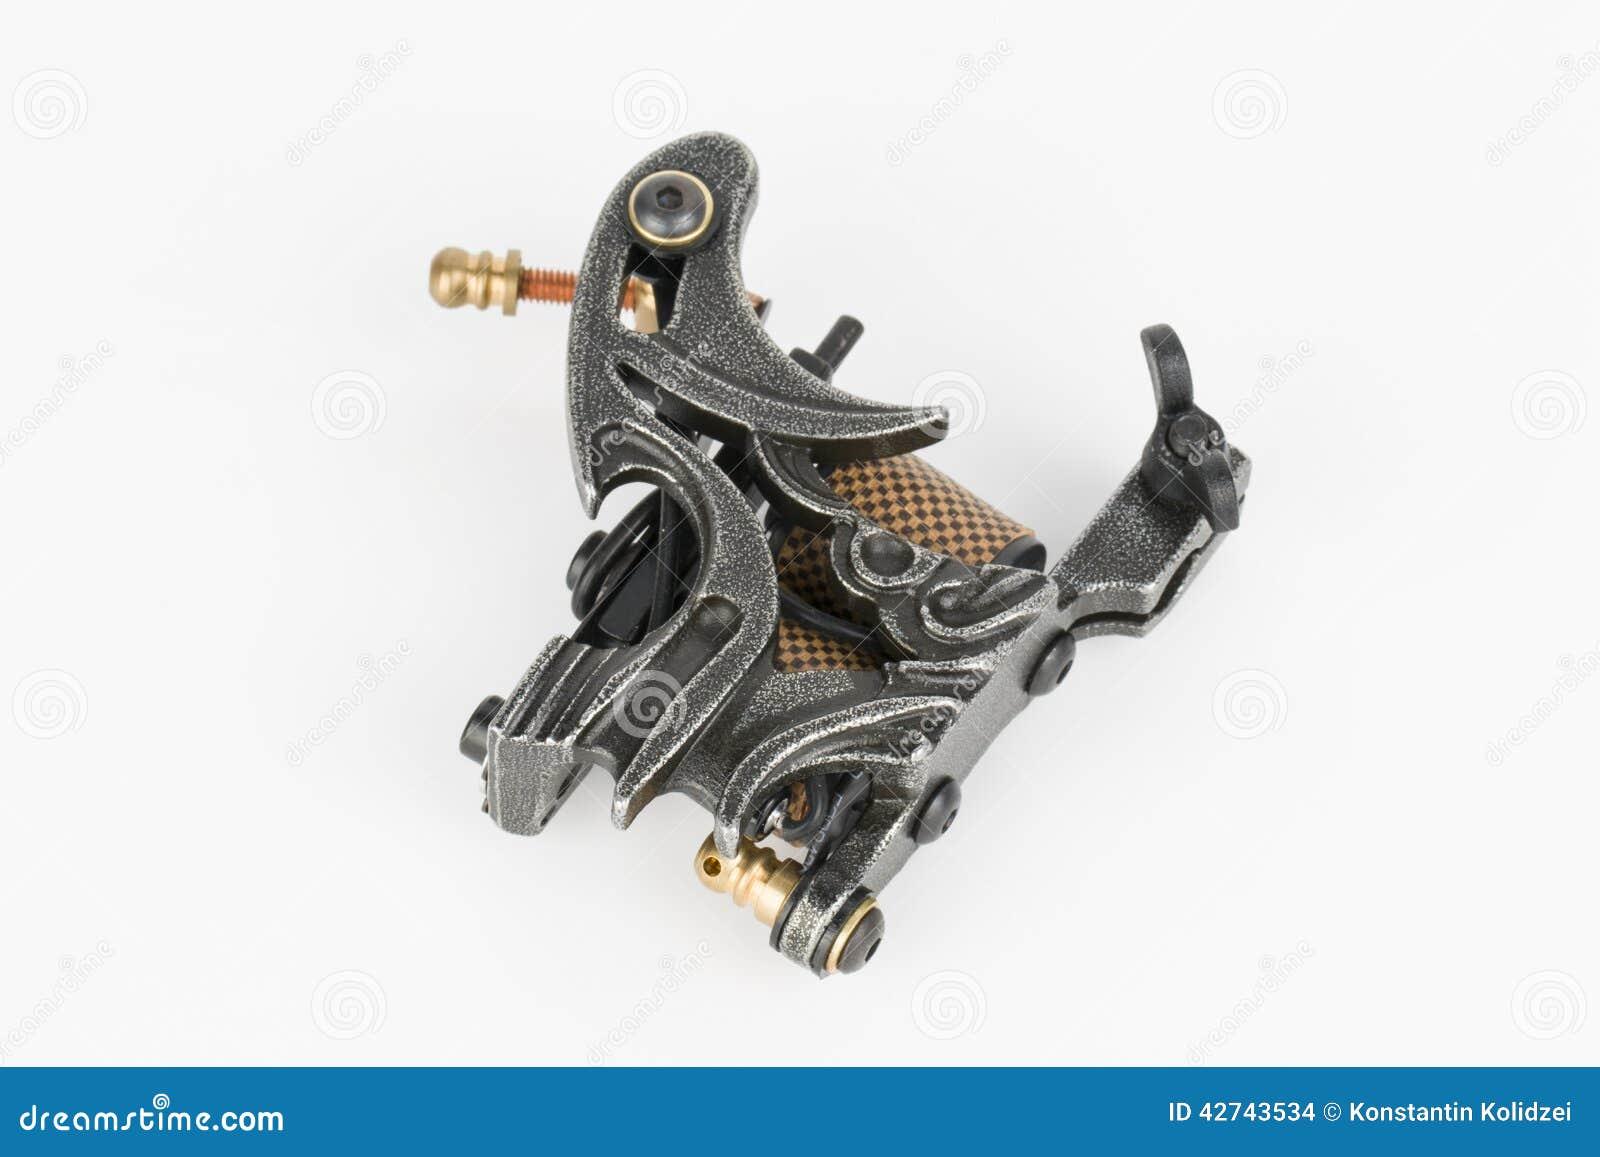 Tattoo machine gun stock photo image 42743534 for Professional tattoo guns